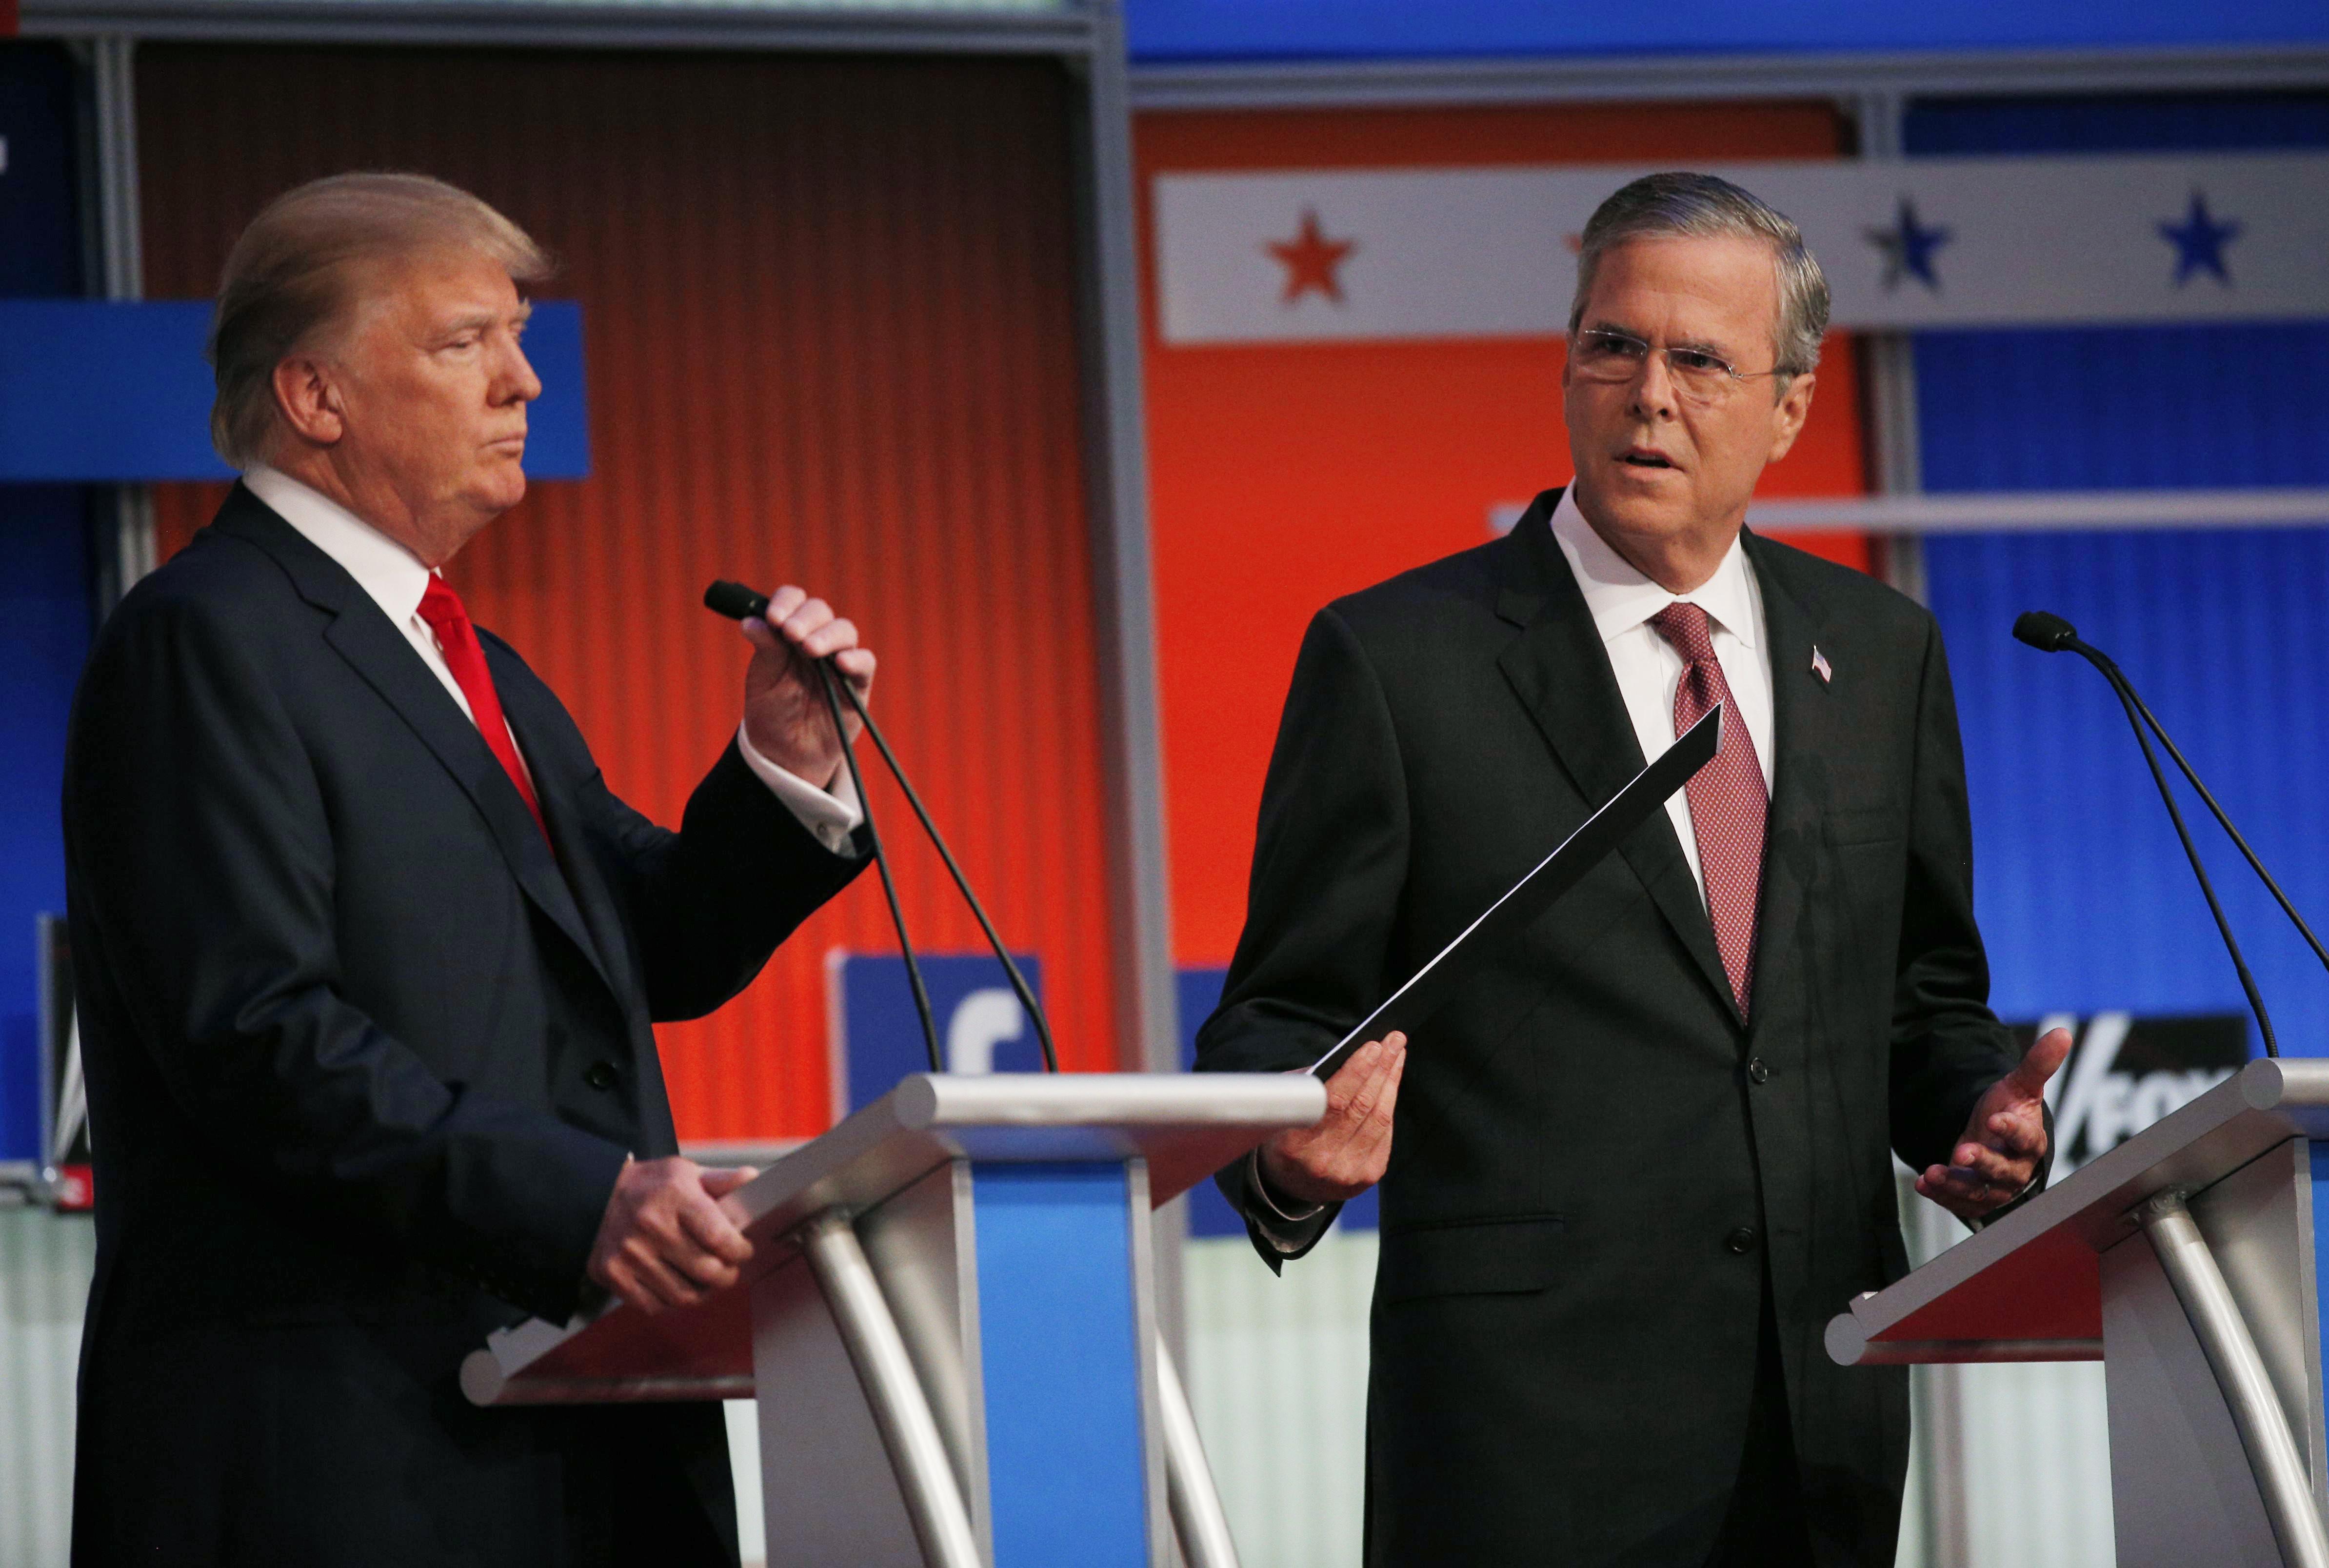 New Hampshire Republican Debate >> Election 2016: Jeb Bush strikes back at Donald Trump in Spanish - CBS News